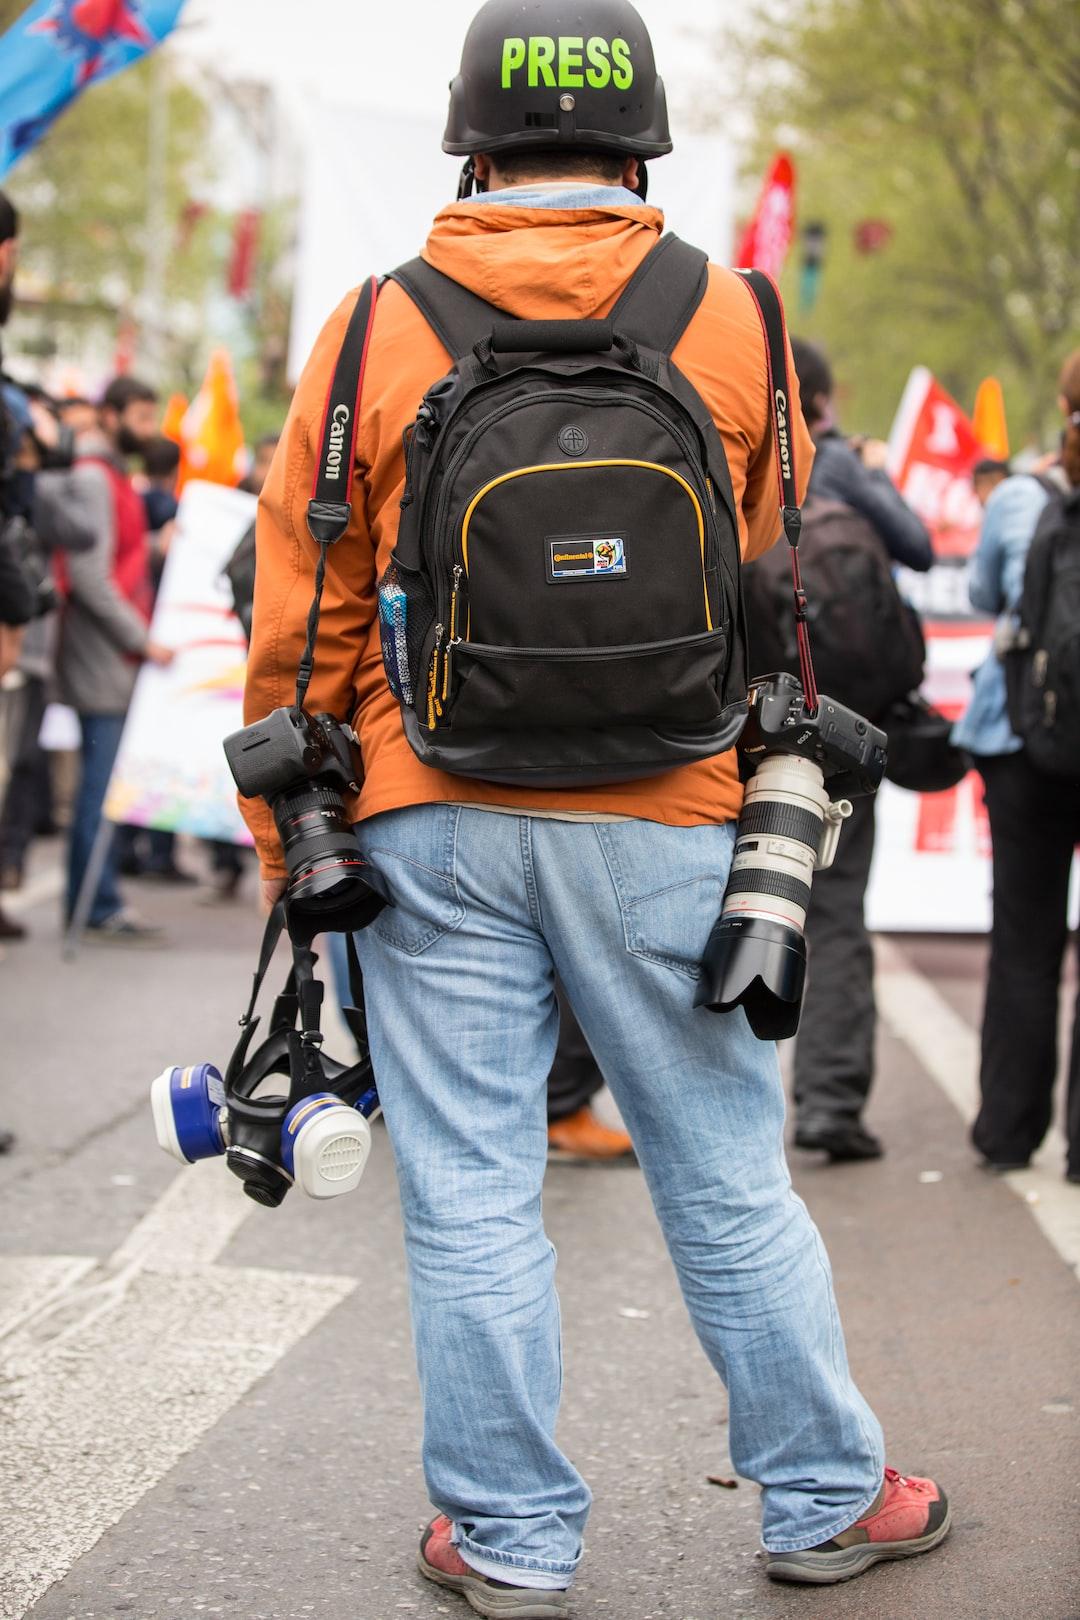 press reporter